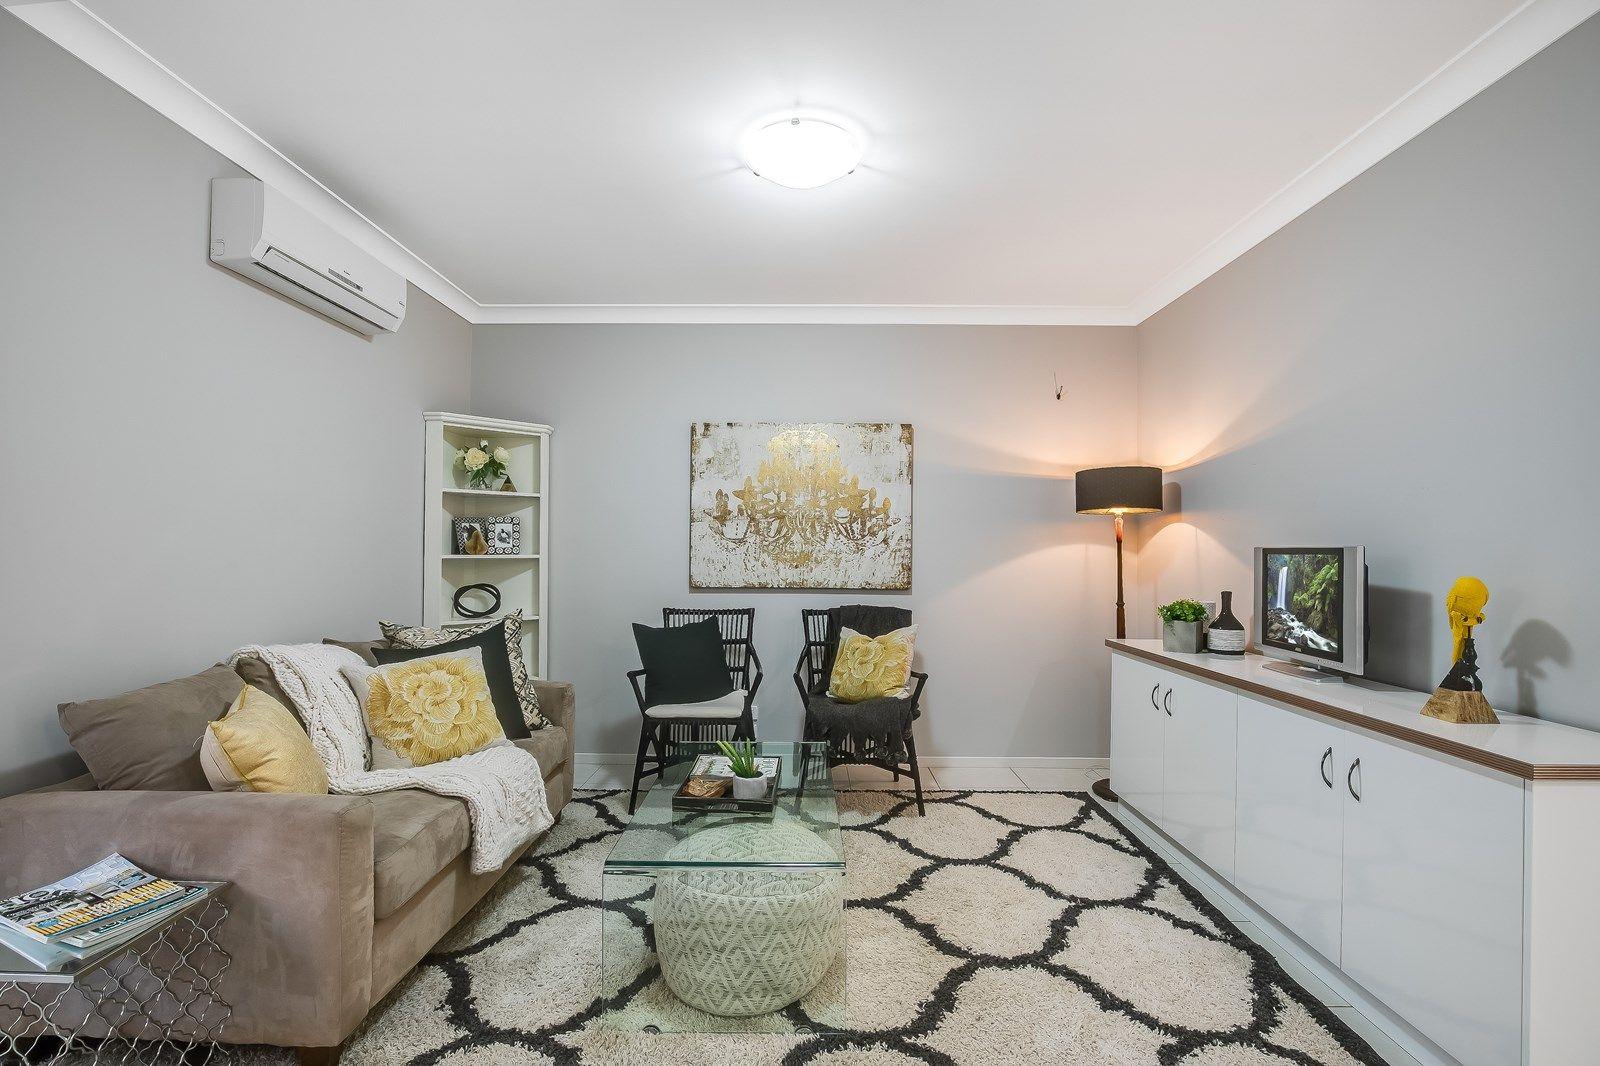 2/5 Messines Street, Harlaxton QLD 4350, Image 2